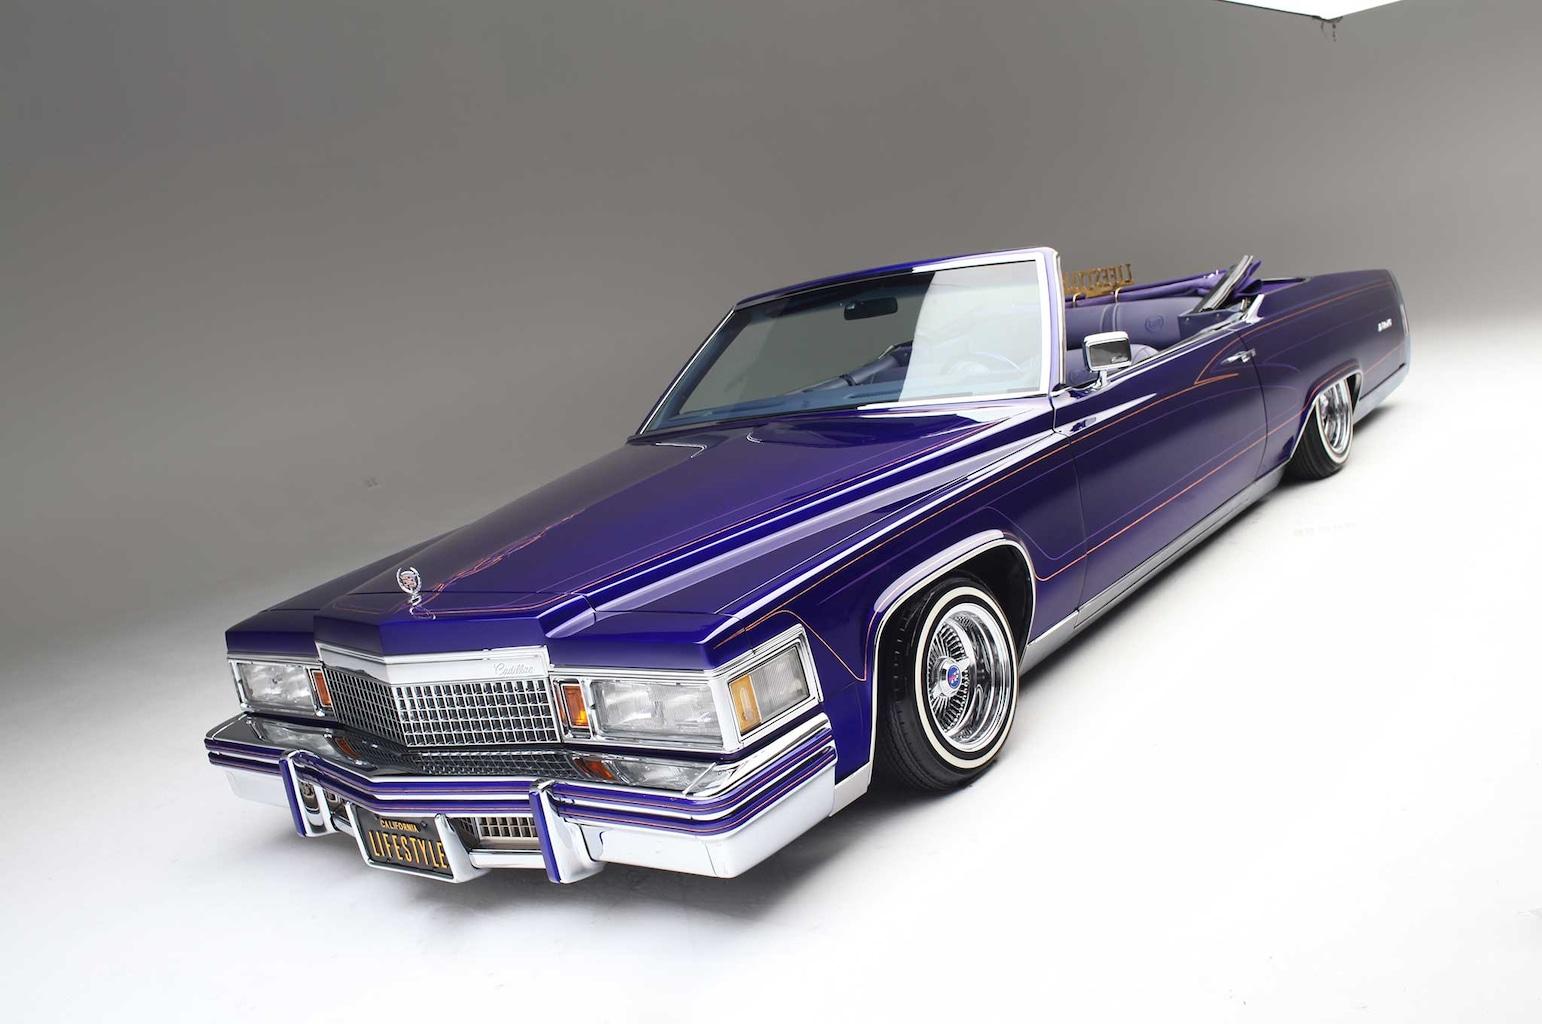 Sites Similar To Craigslist >> 1979 Cadillac Le Cabriolet - Purple Rein - Lowrider